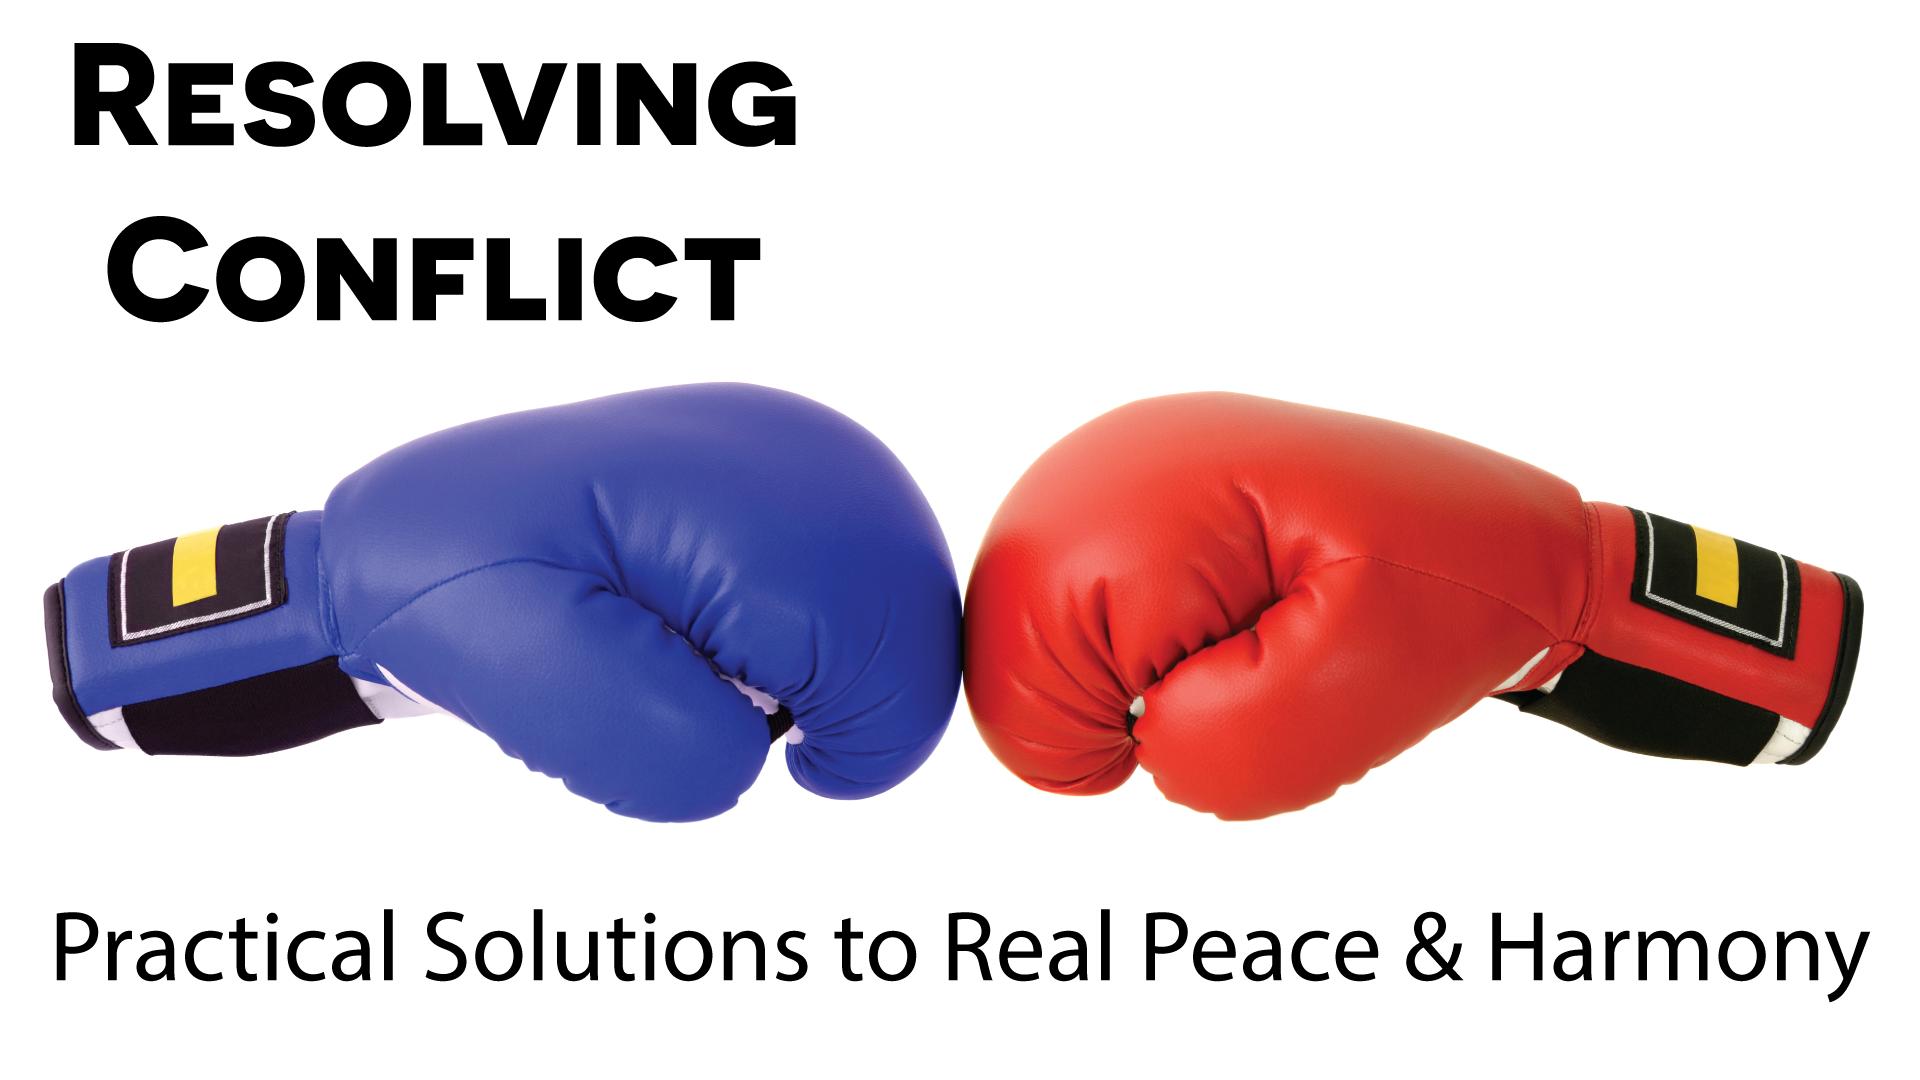 Resolving-Conflict-1920x1080